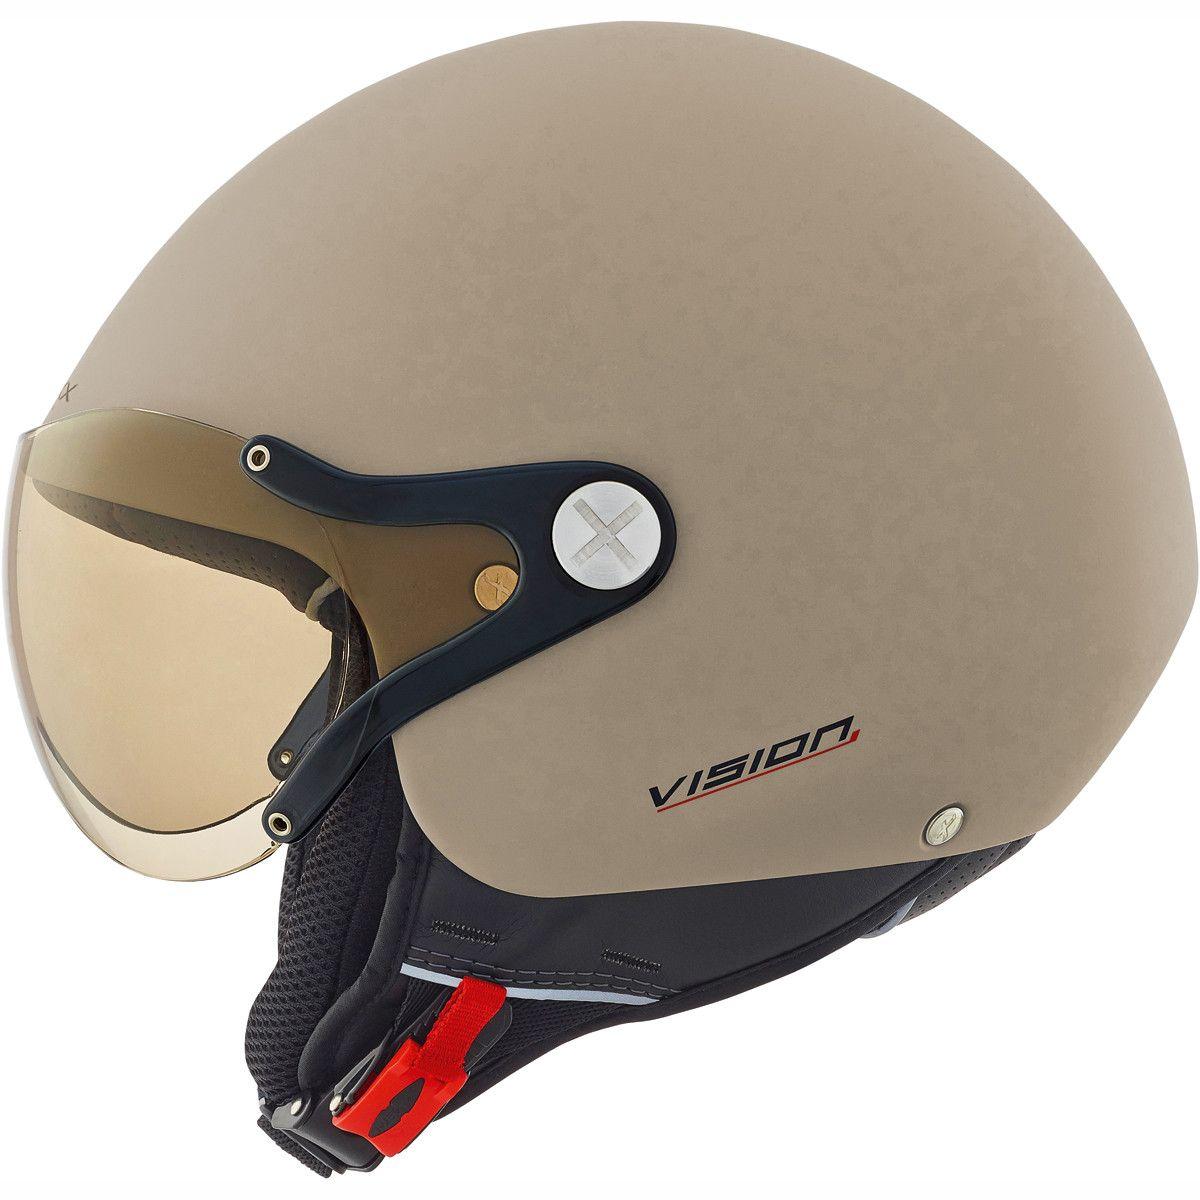 23c924a0 Nexx X60 Vision Plus Helmet in Tan - Stylish, lightweight, composite fibre,  urban helmet with internal sun visor from #Nexx.